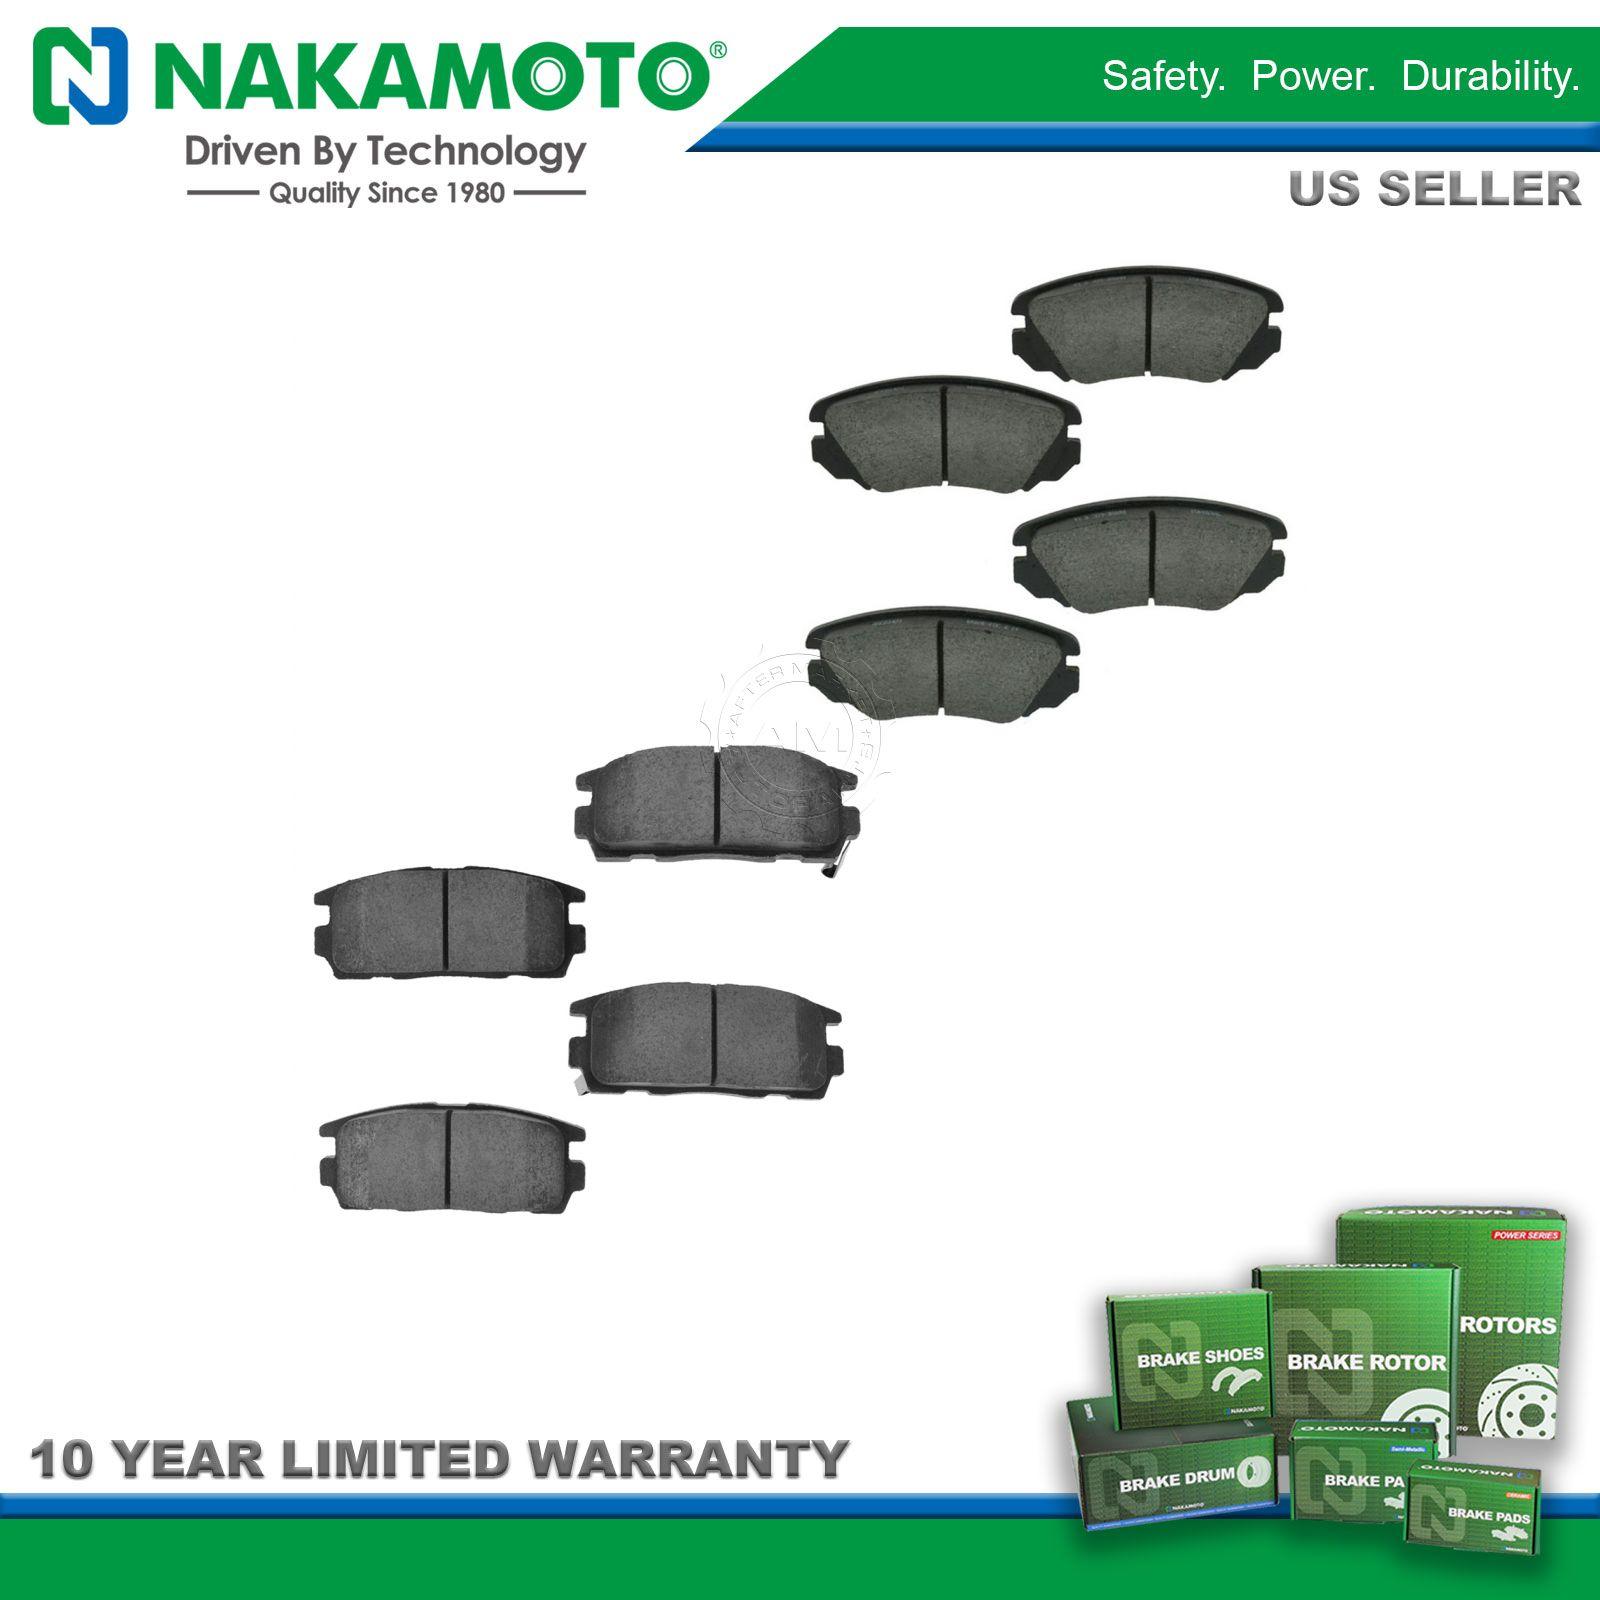 Nakamoto Ceramic Brake Pad Front Rear Kit for Buick Chevy Equinox ...